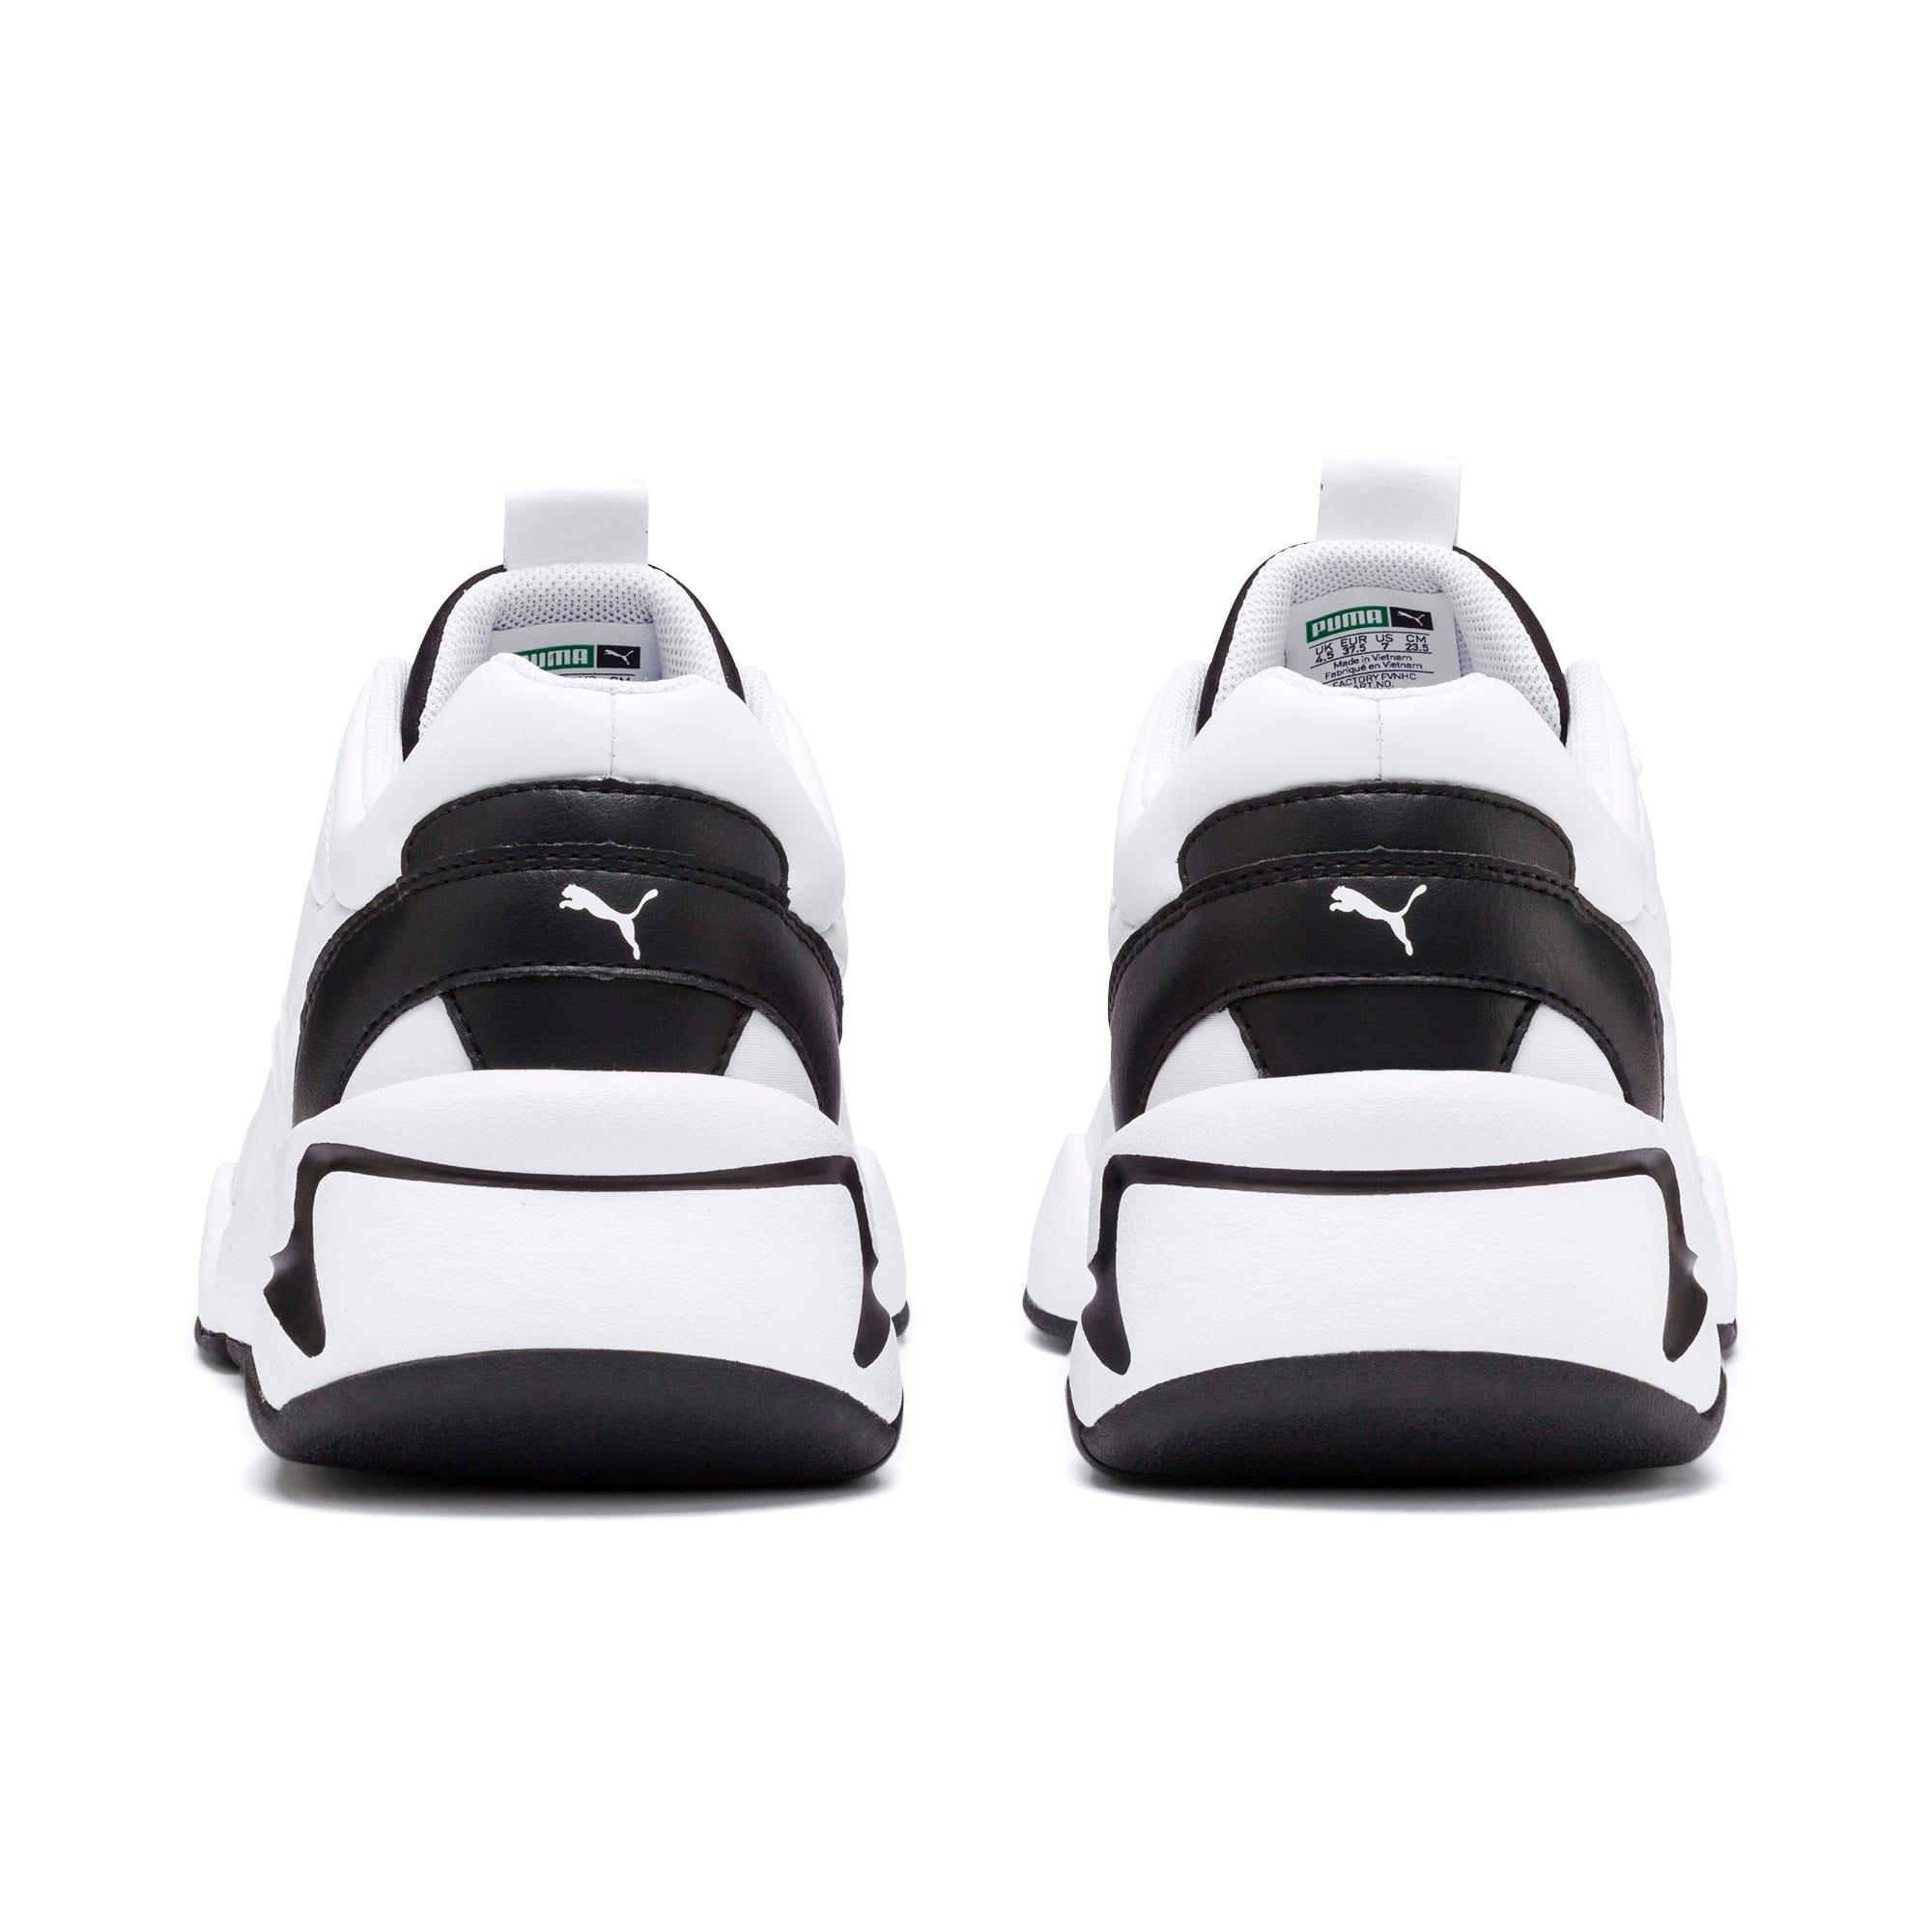 Thumbnail 4 of Nova Women's Sneakers, Puma White-Puma Black, medium